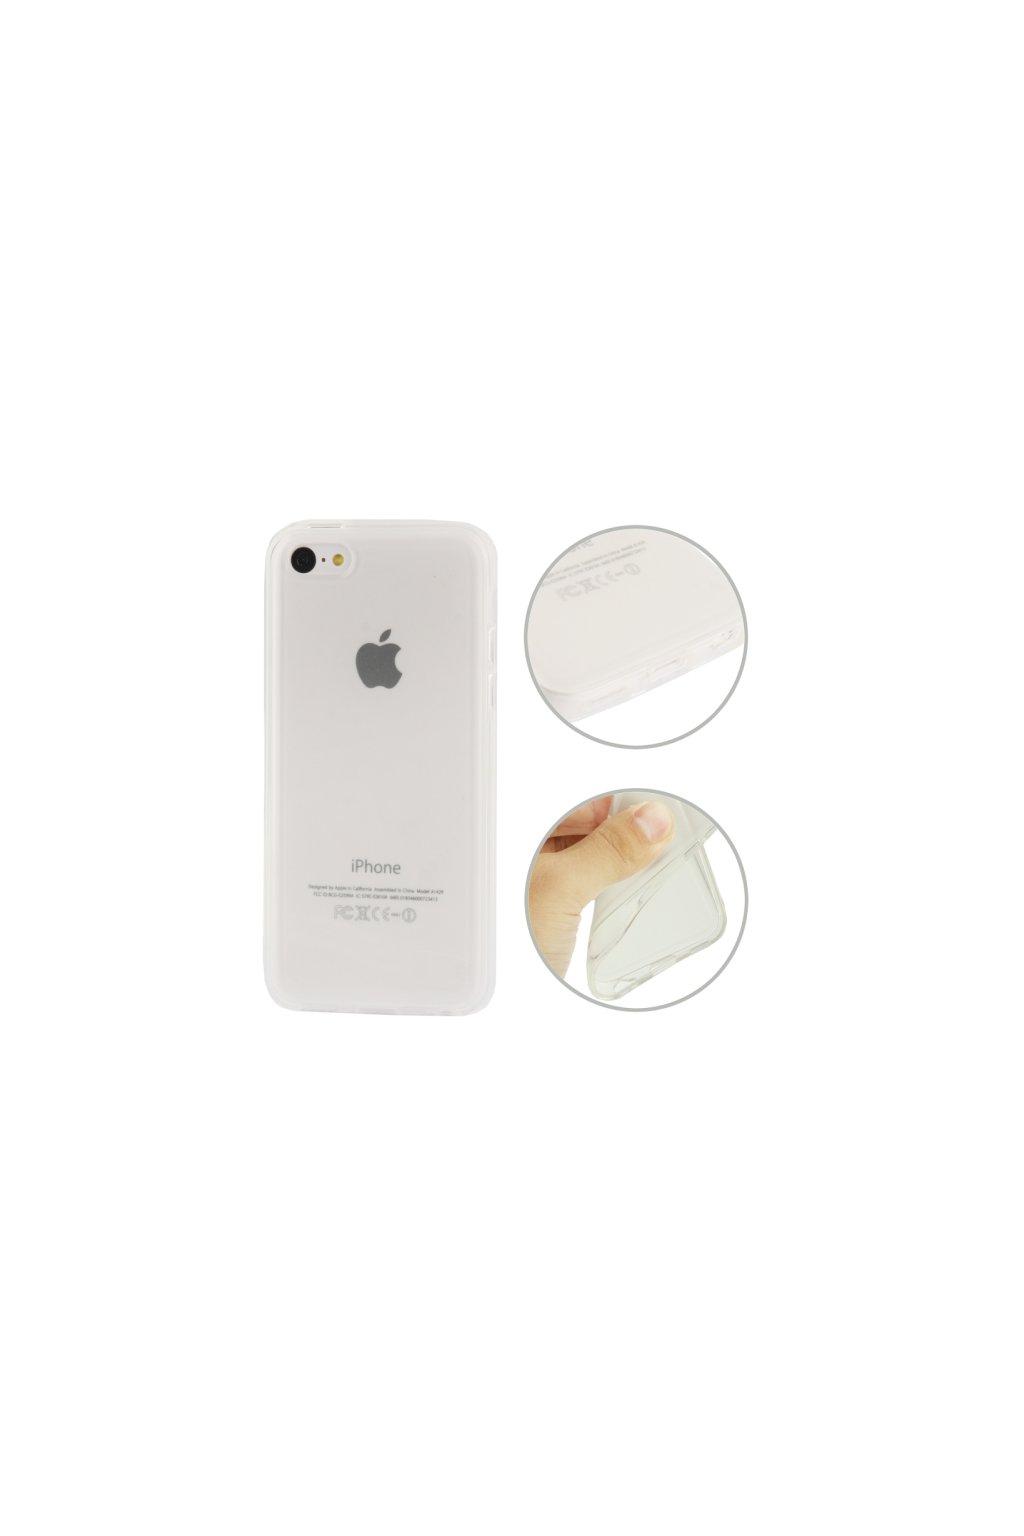 Pouzdro matné TPU iPhone 5C, transparentní